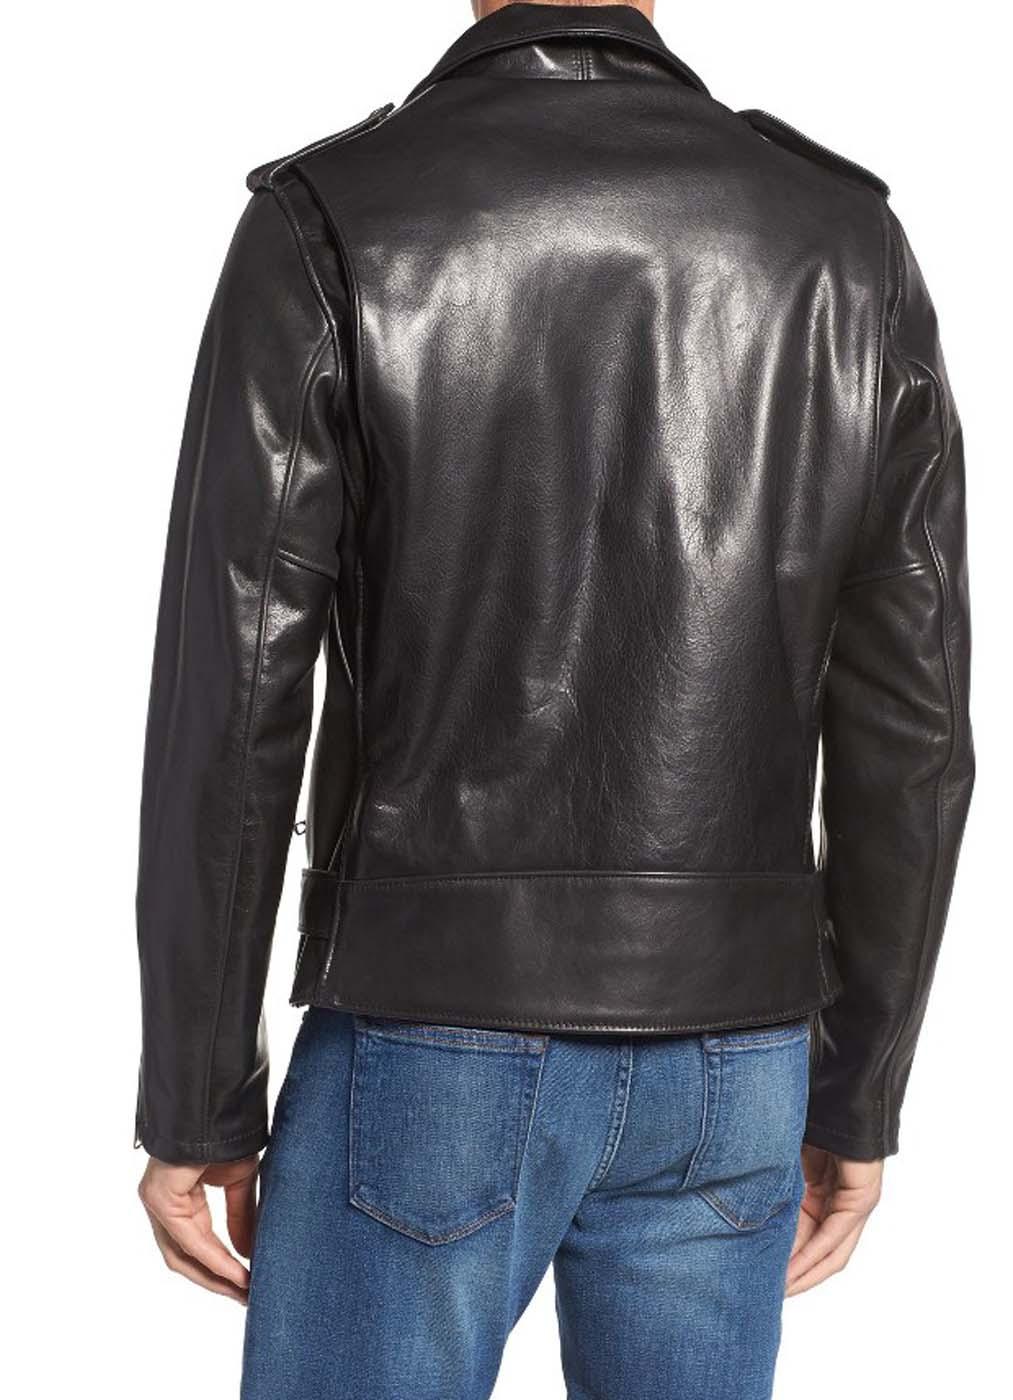 Leather Moto Jacket For Men 3..